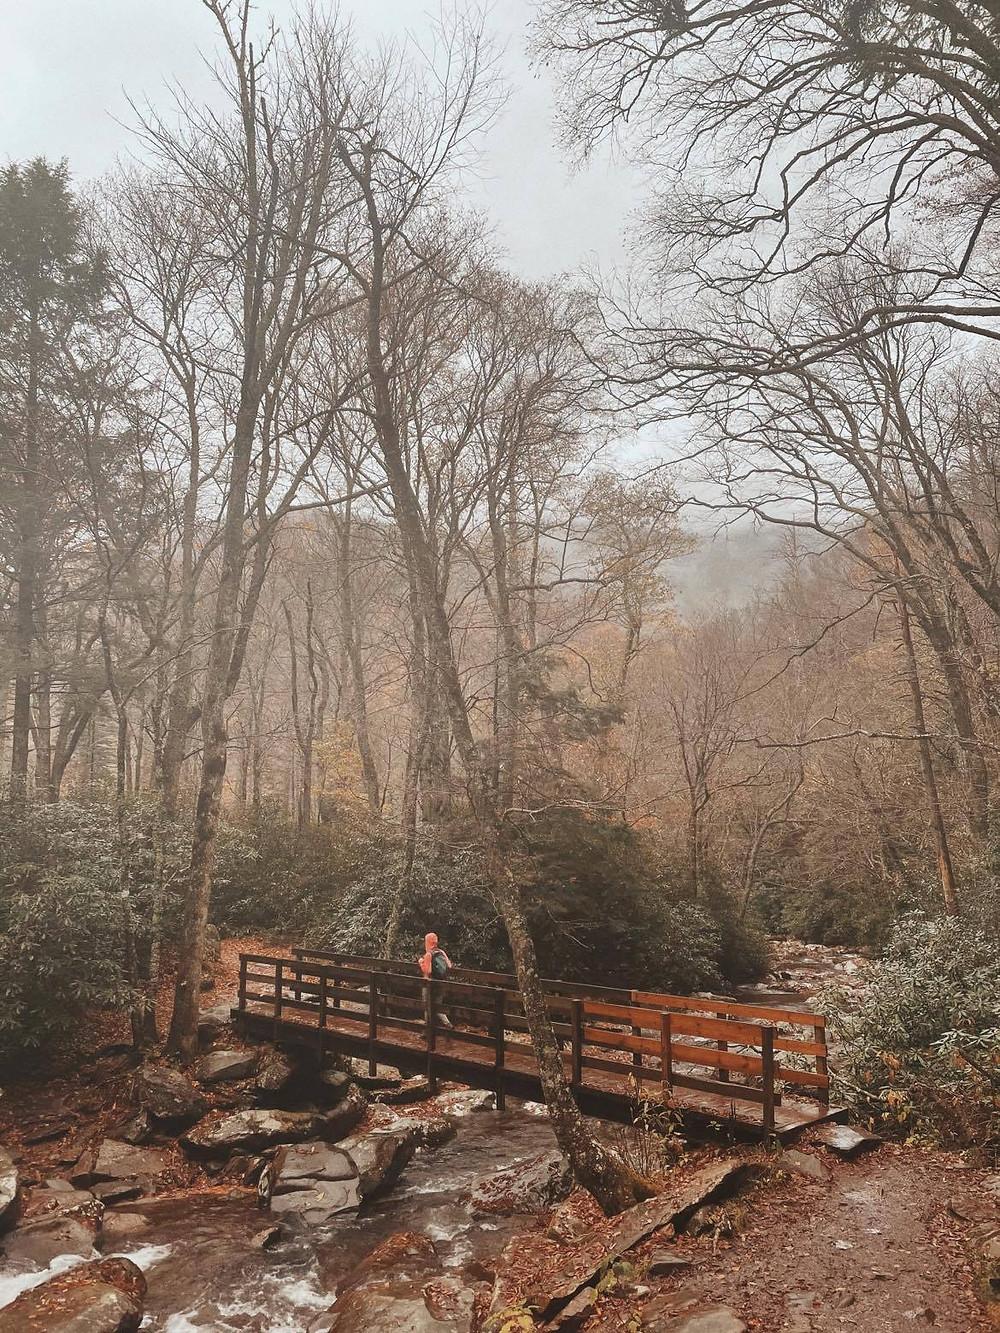 hiking-across-footbridge-at-smoky-mountains-national-park-by-appleton-wedding-photography-kyra-rane-photography